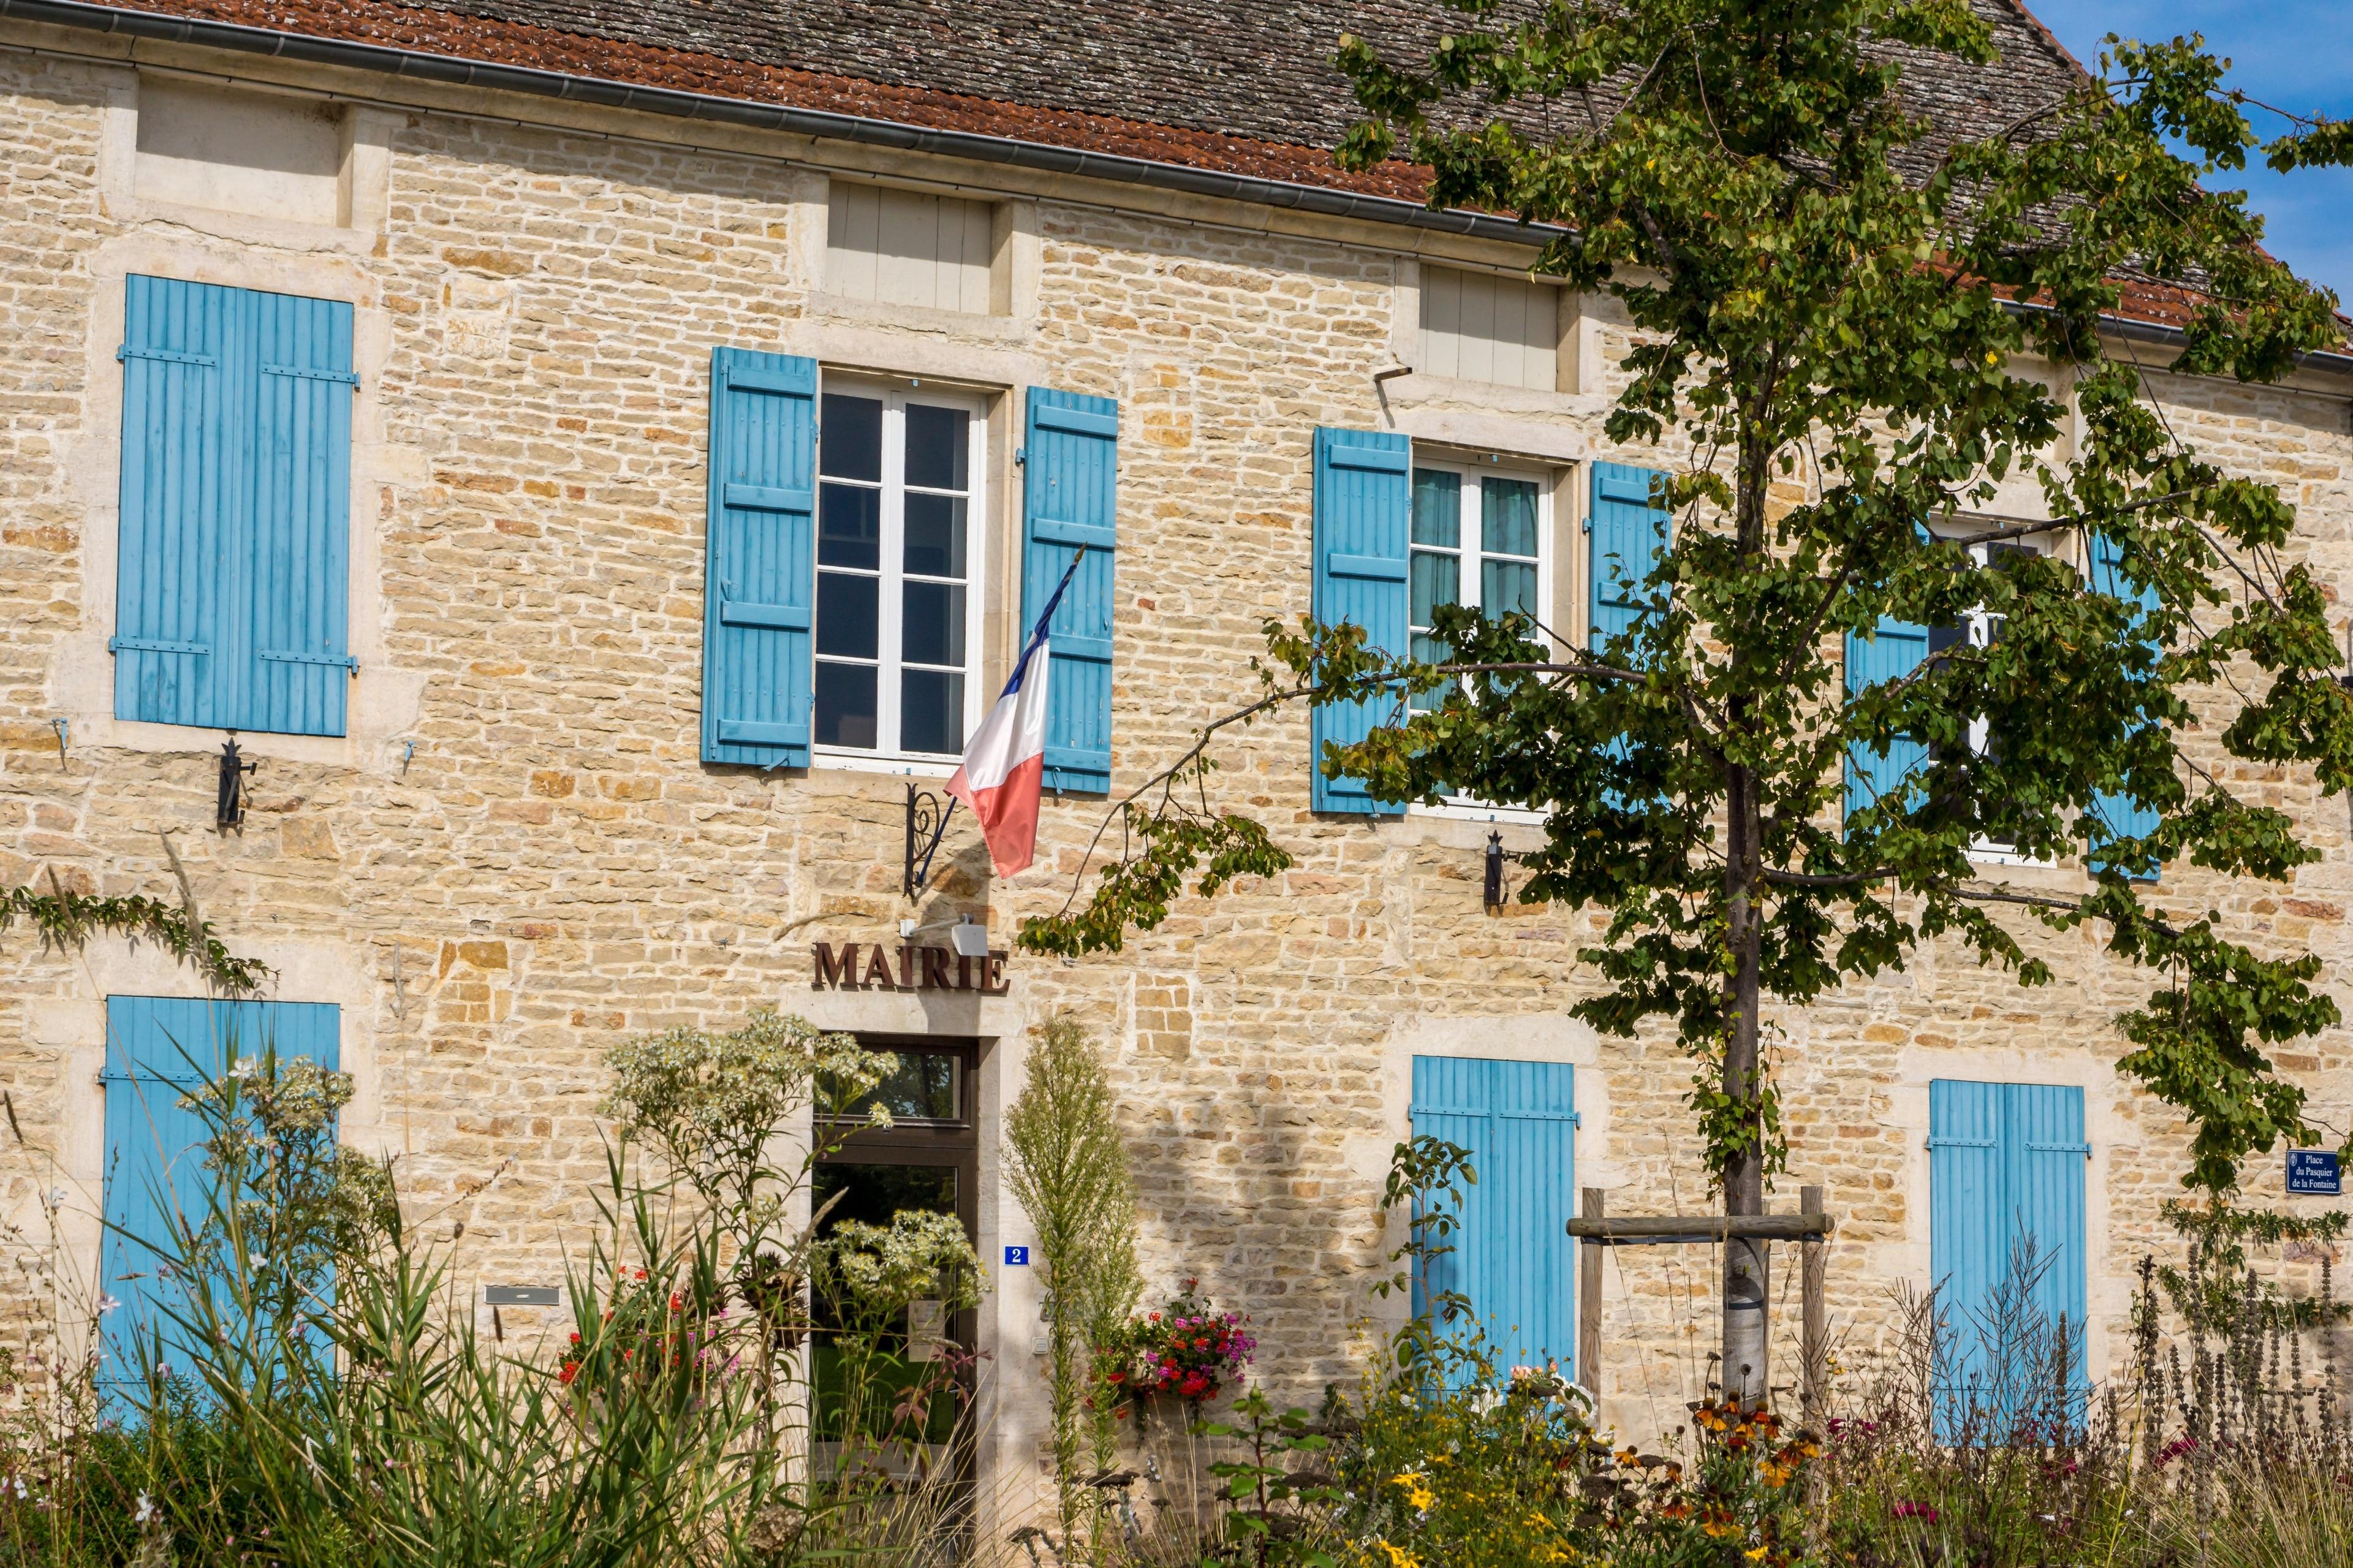 Puligny-Montrachet, Cote d'Or, France